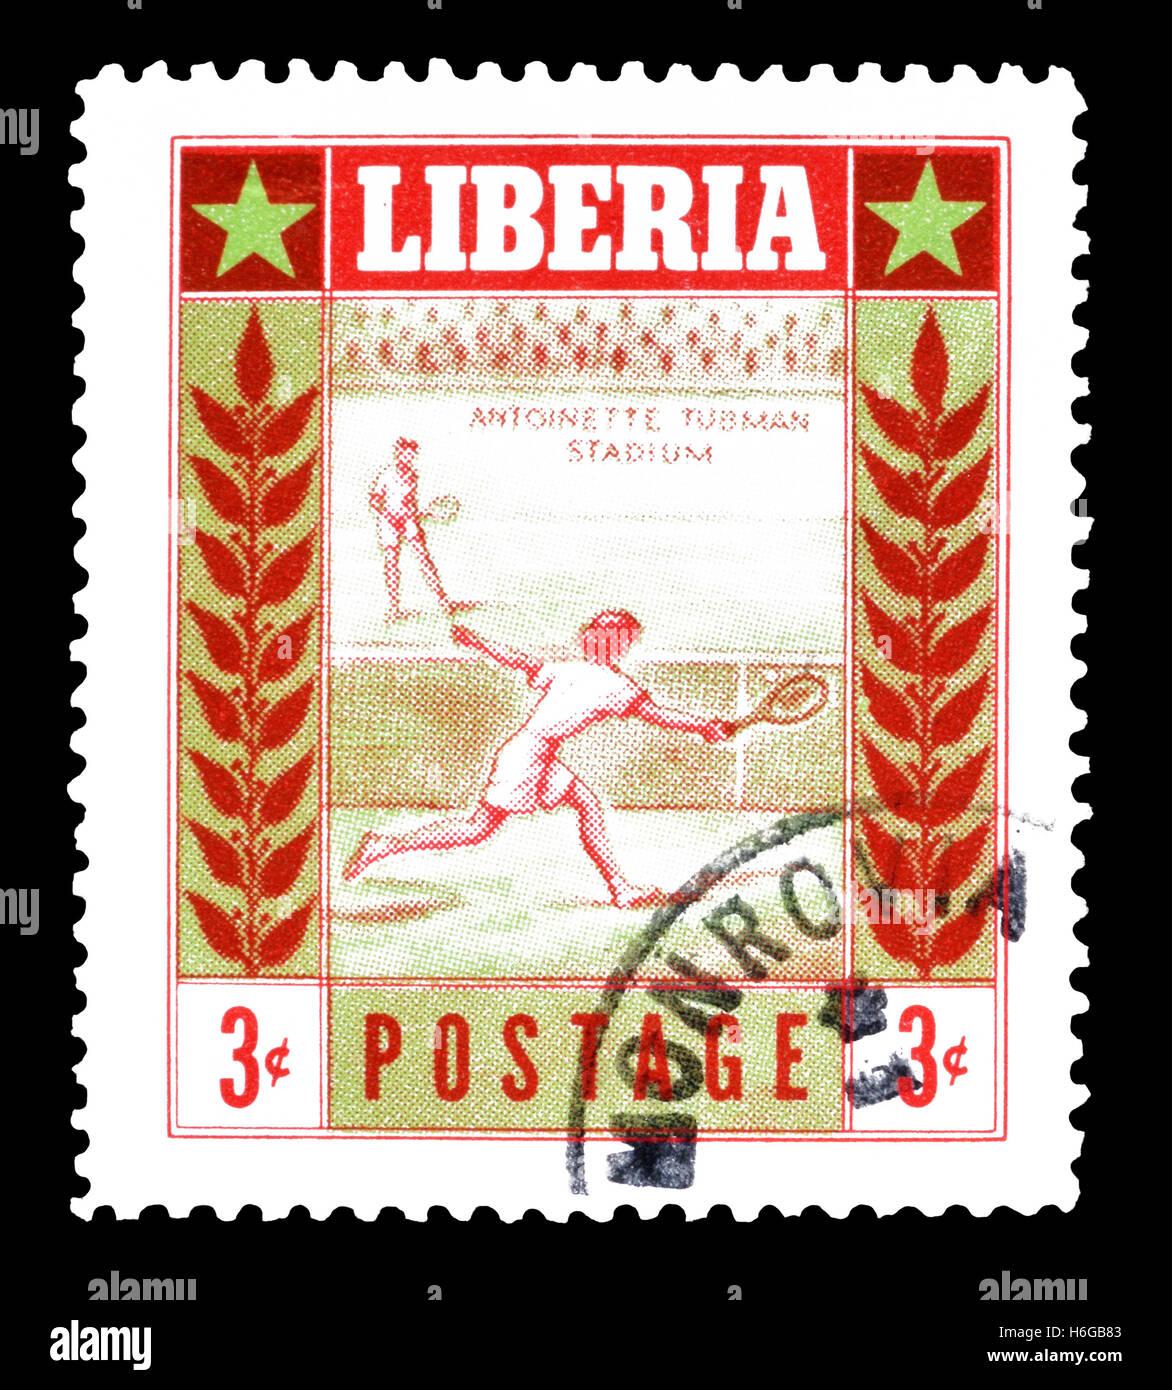 Liberia stamp 1955 Stock Photo